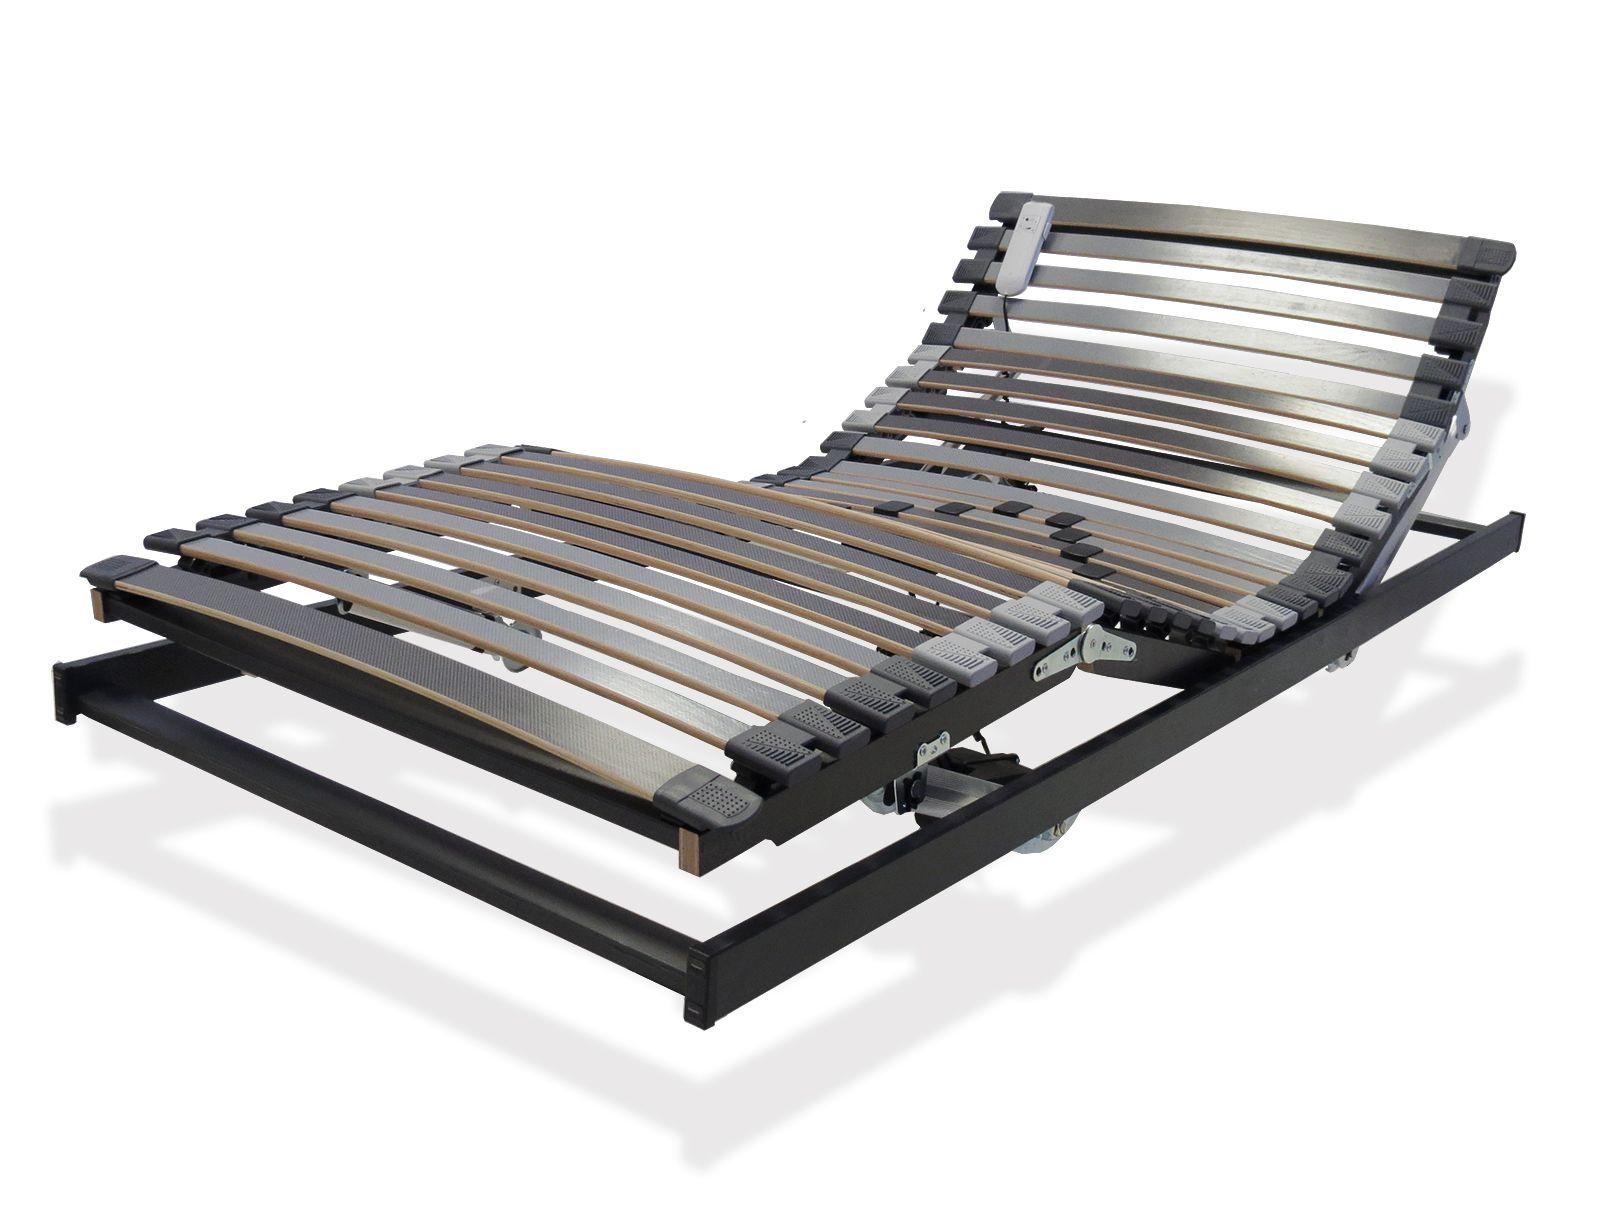 motor lattenrost elektrisch orthowell ultraflex xl motor. Black Bedroom Furniture Sets. Home Design Ideas